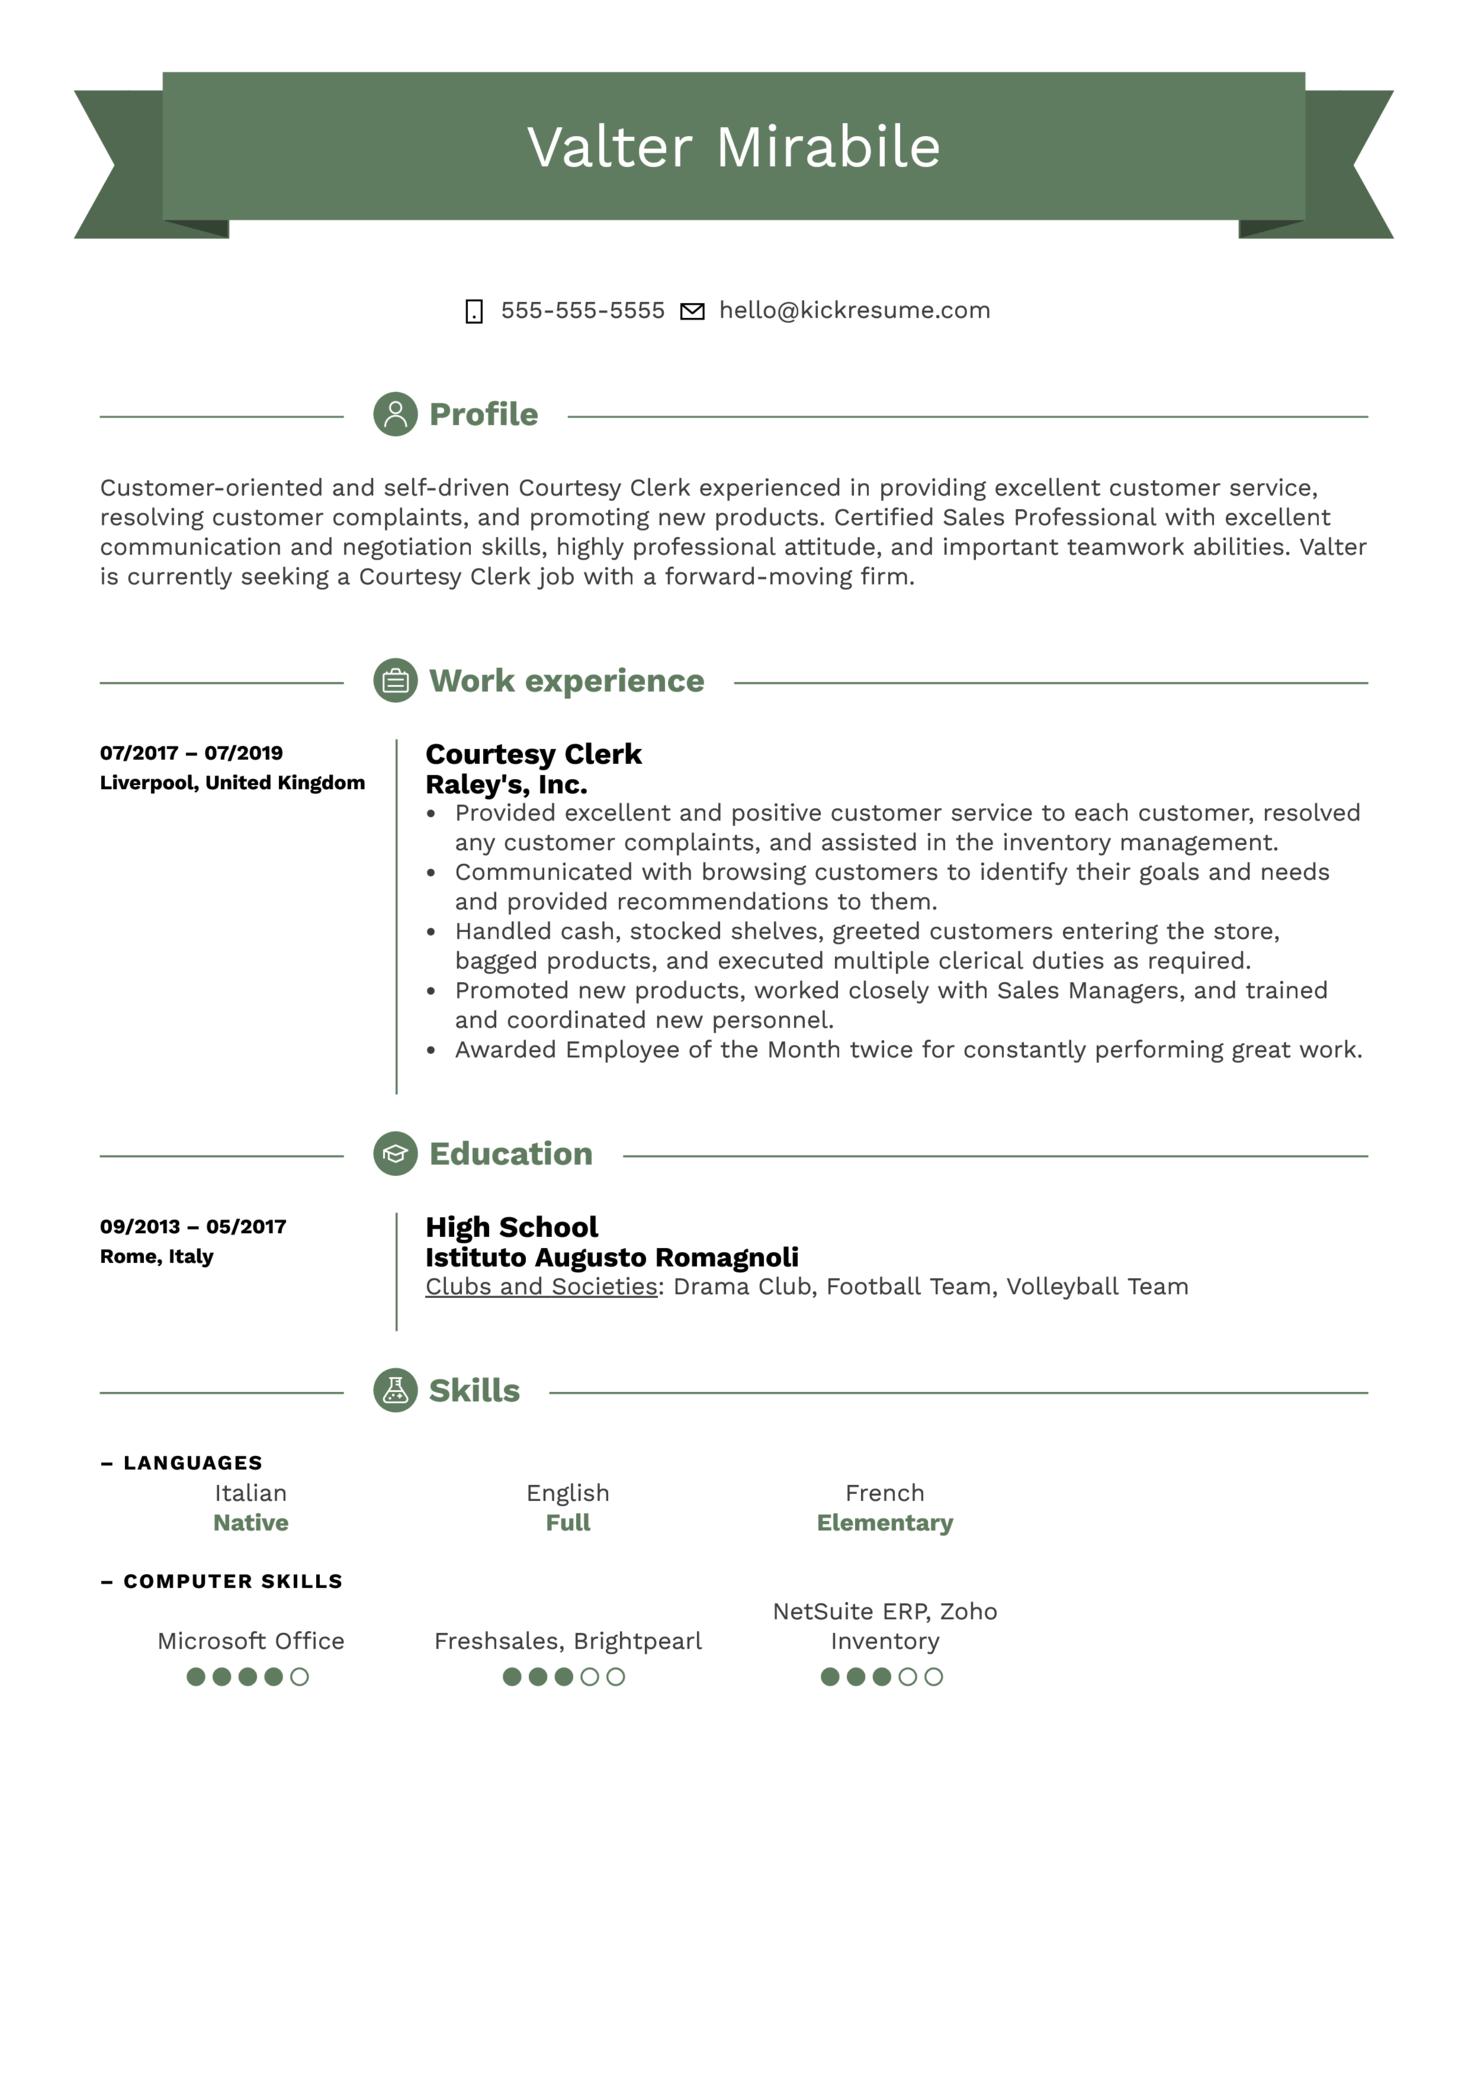 Courtesy Clerk Resume Example (parte 1)